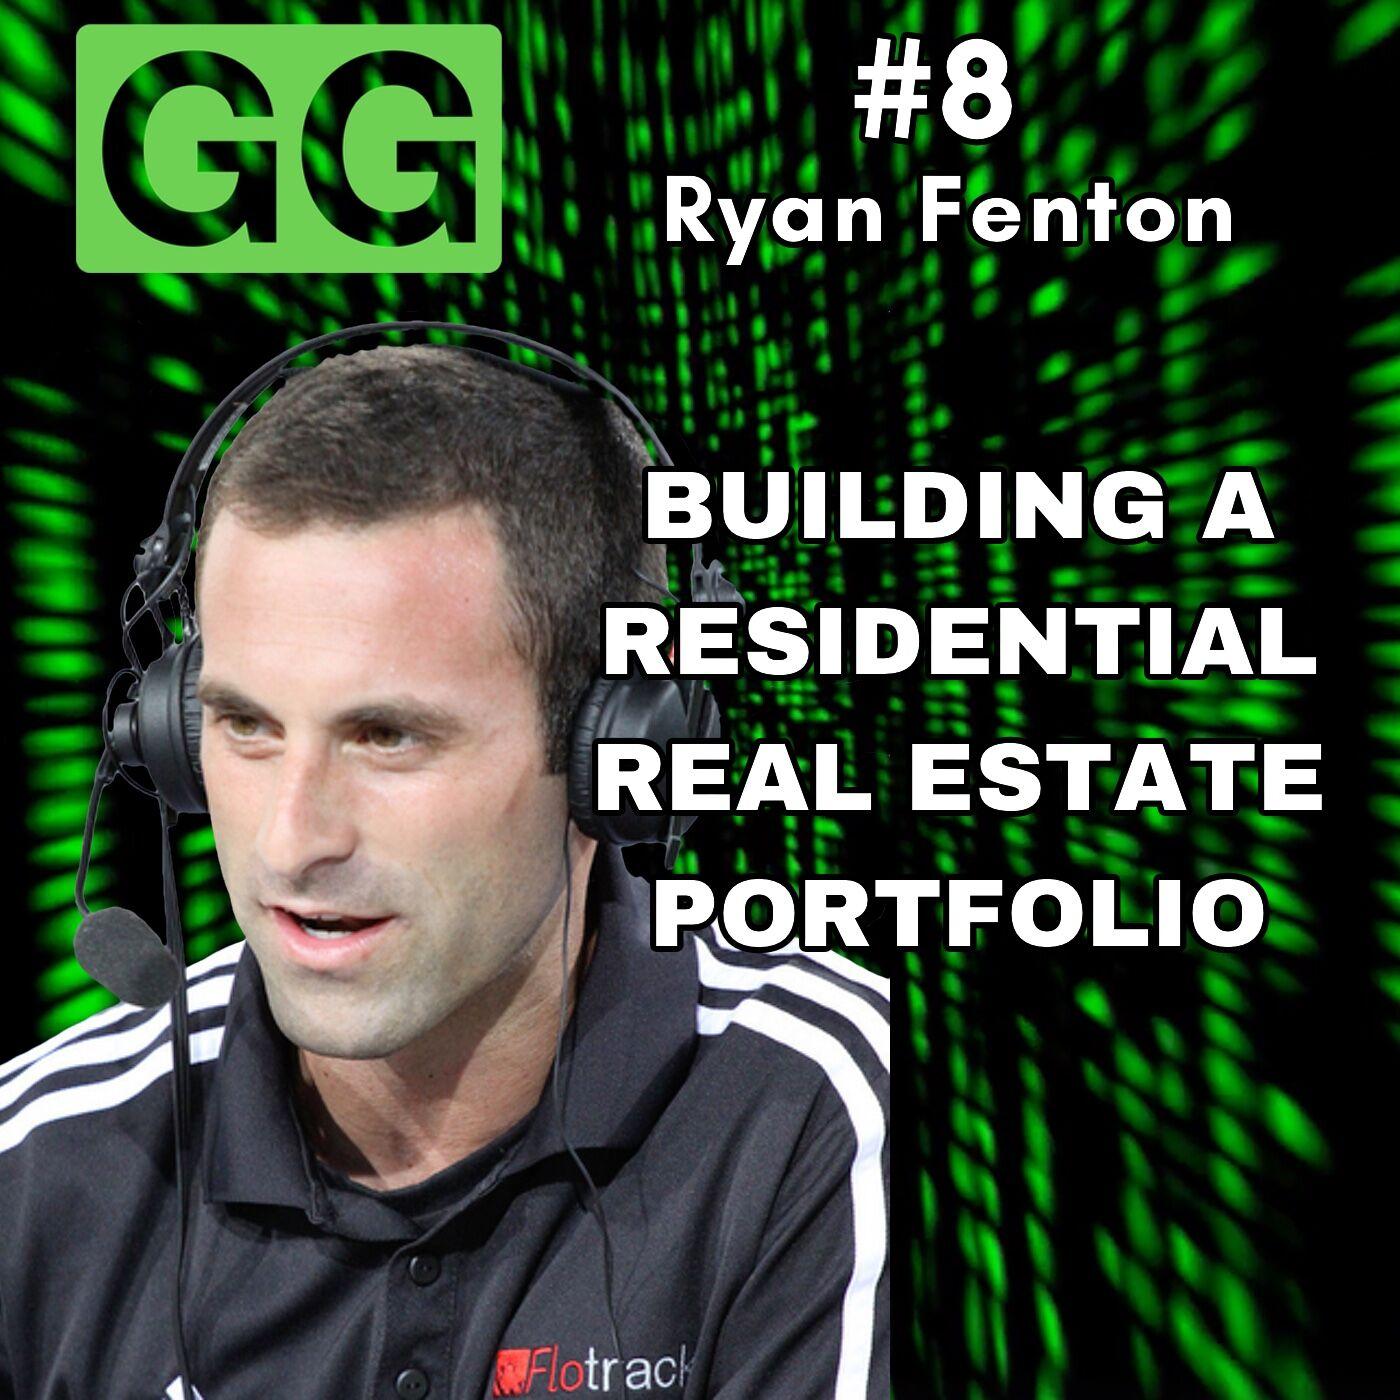 #8 - Ryan Fenton: Building a Residential Real Estate Portfolio